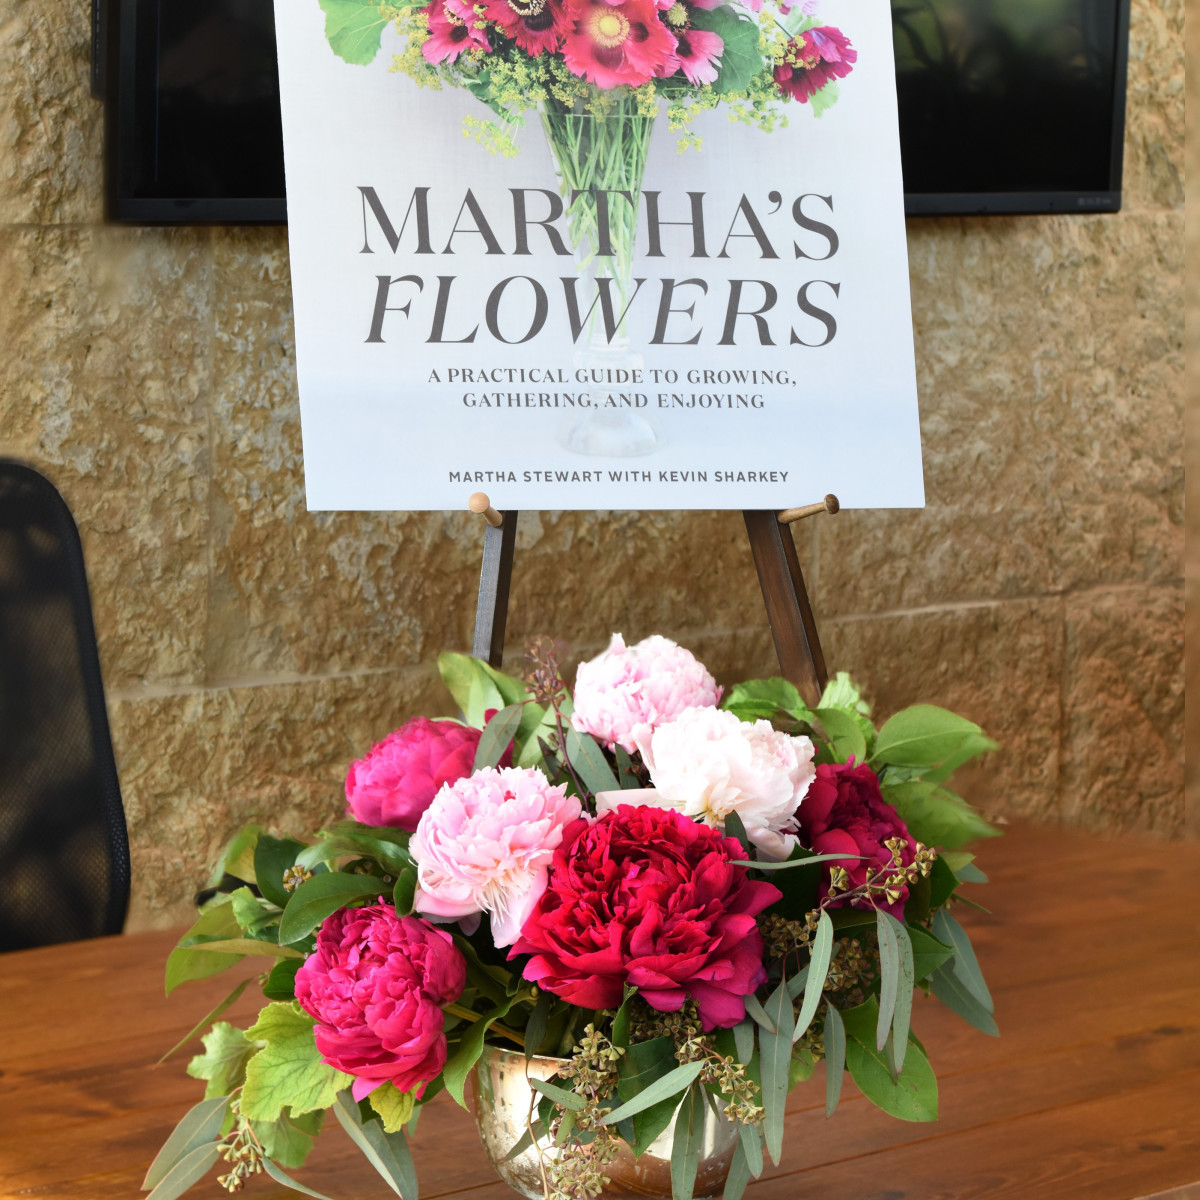 Martha Stewart event at Dallas Arboretum 2018